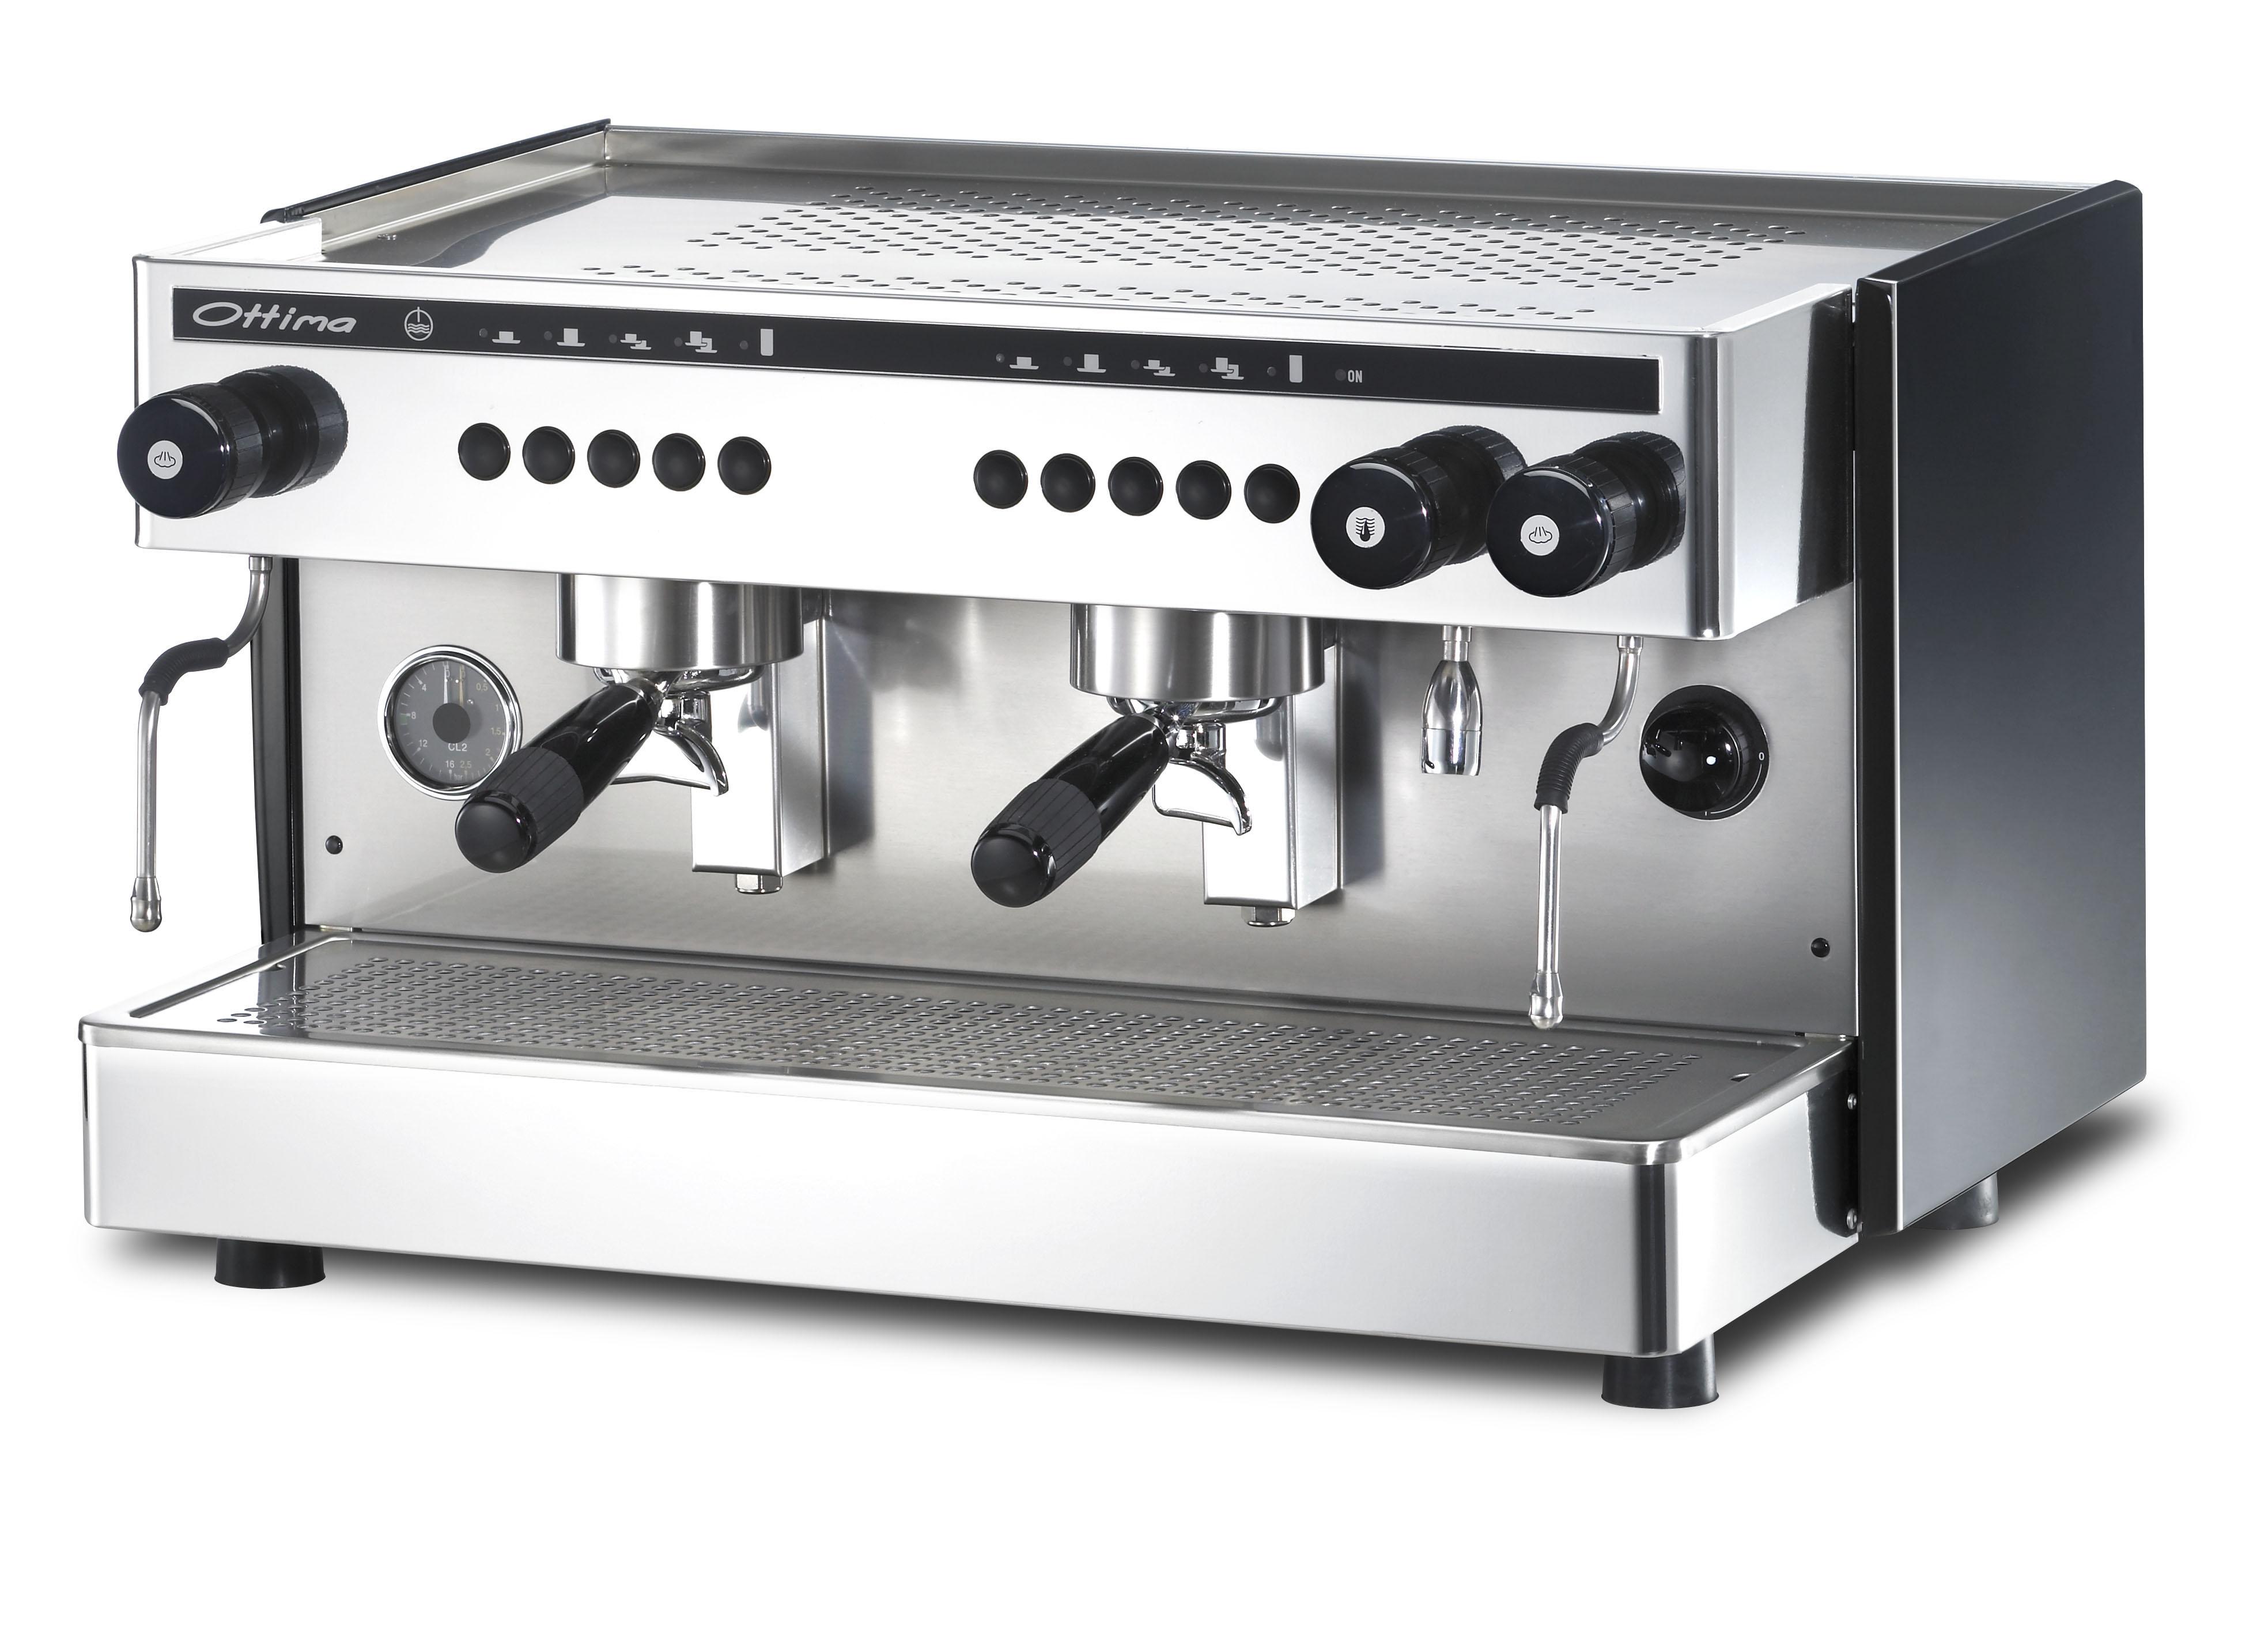 cafetera industrial ottima